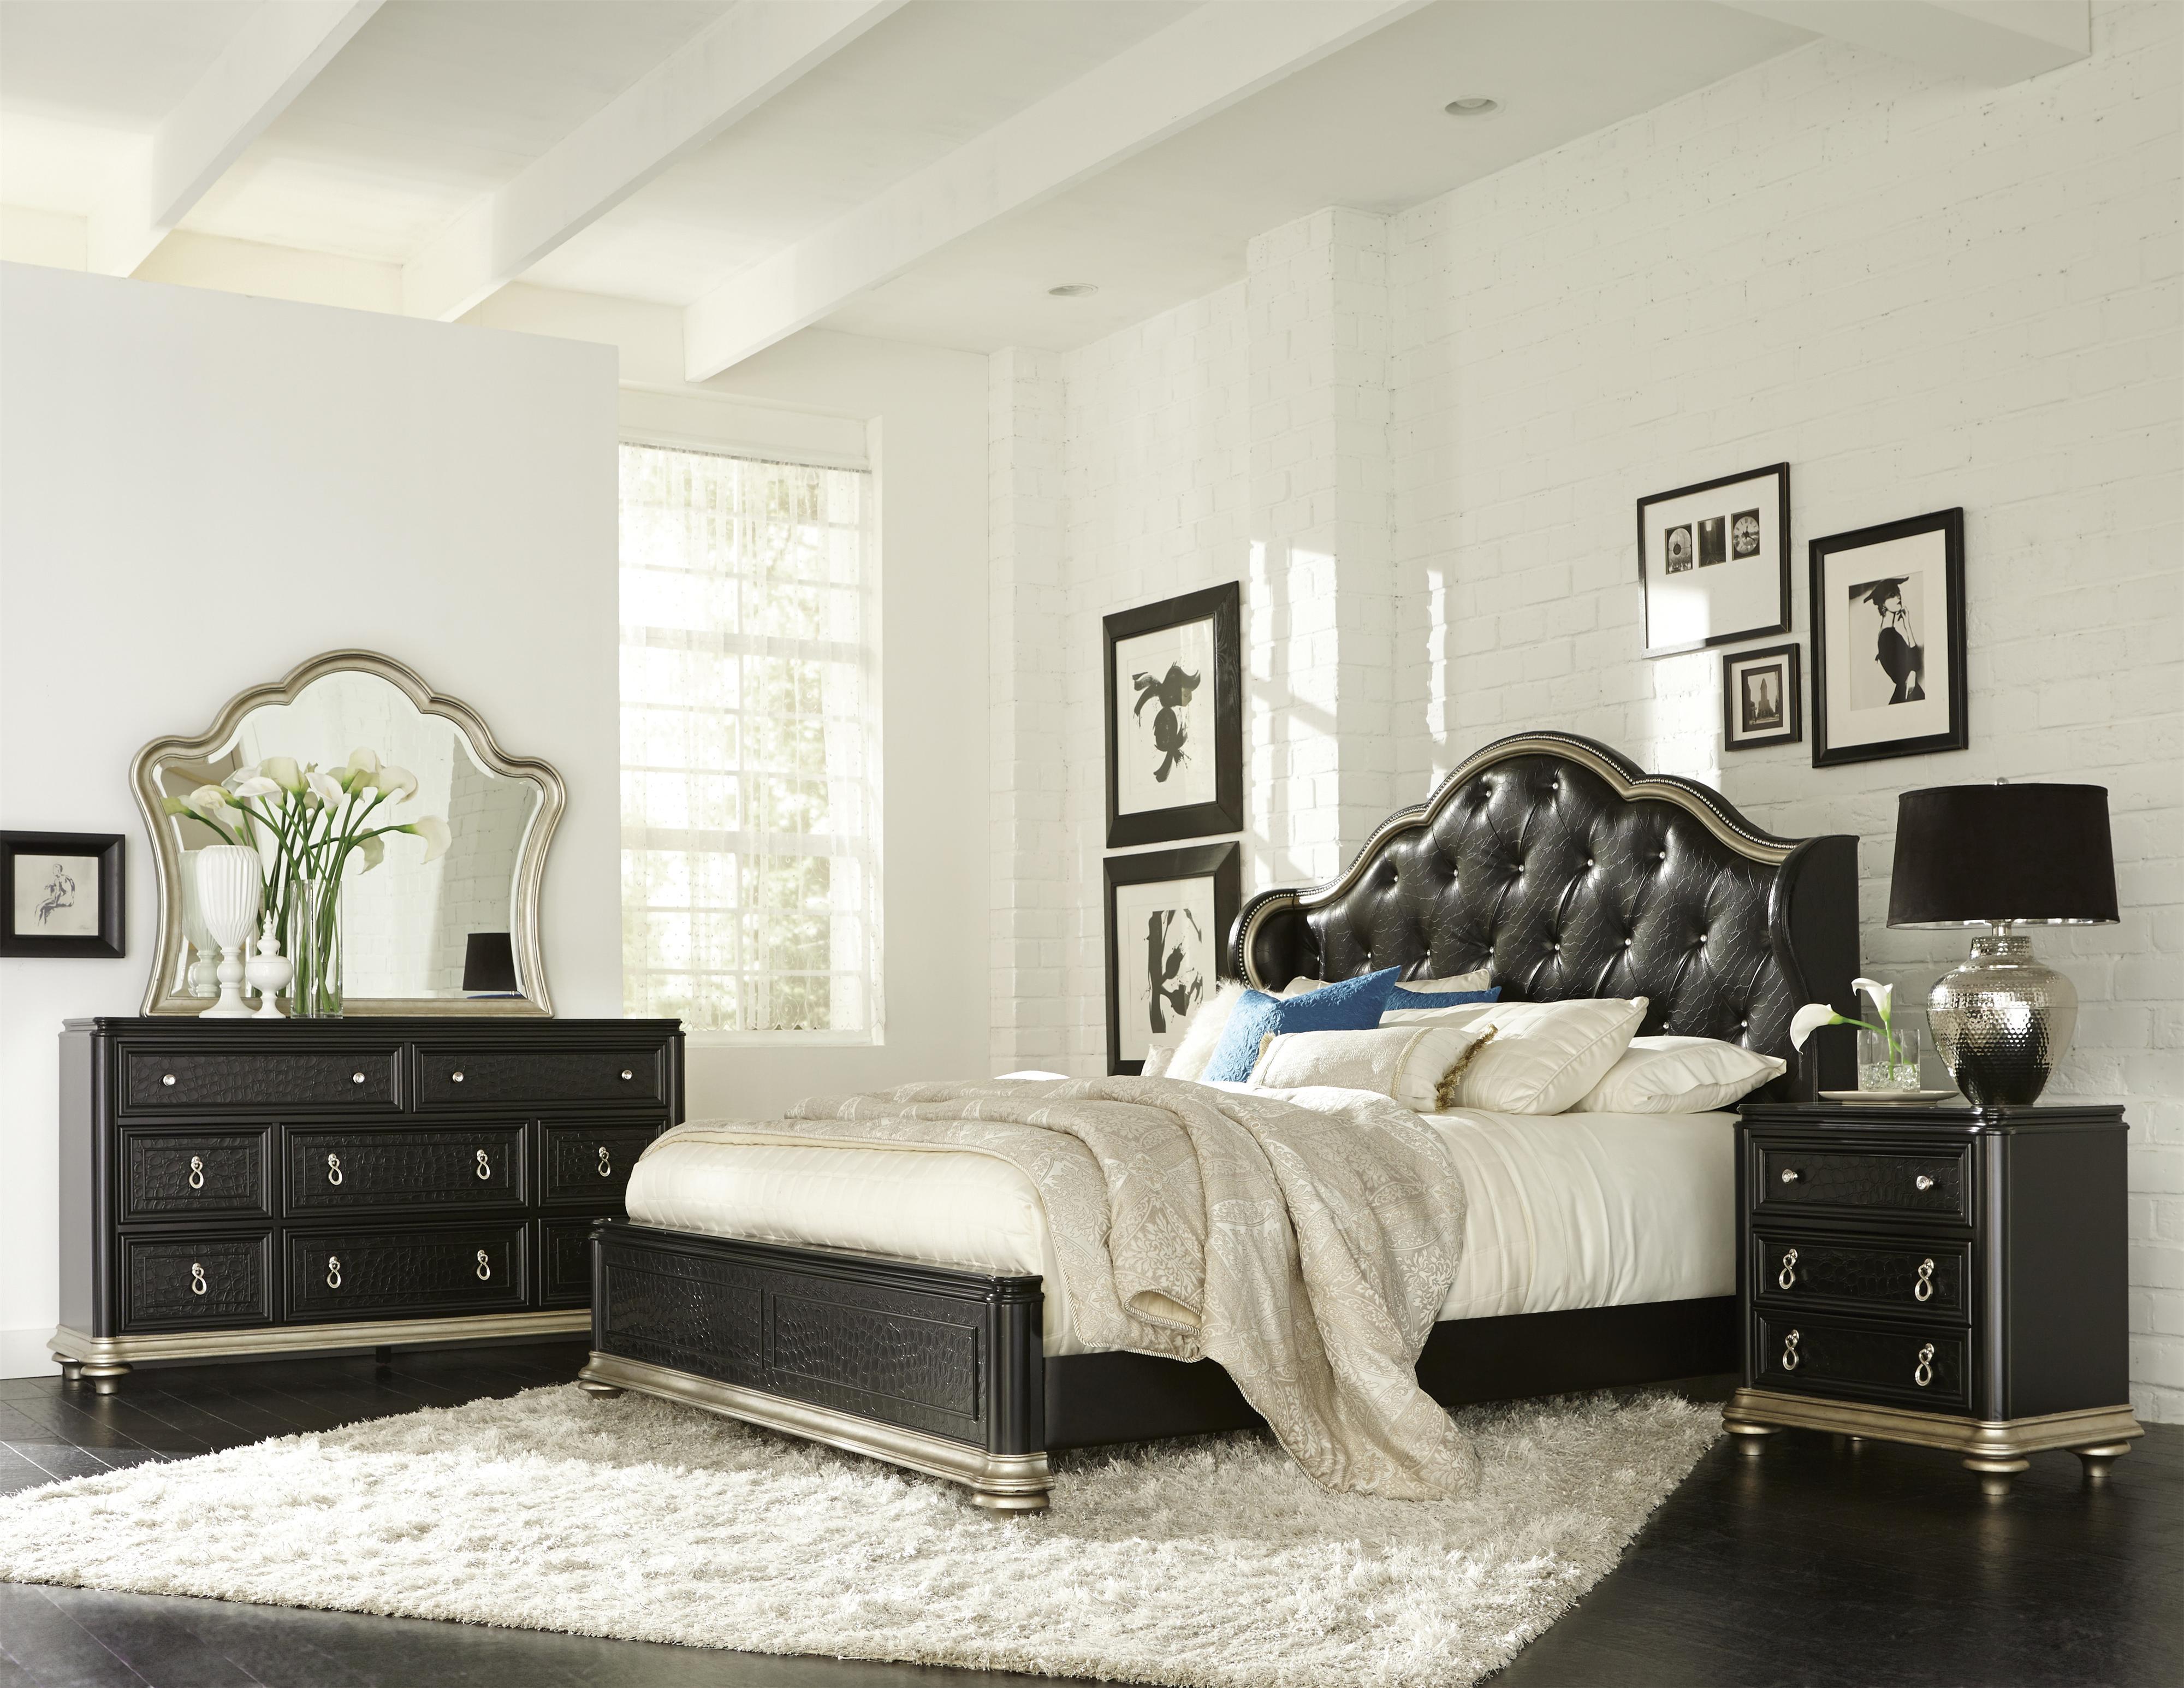 Samuel Lawrence Avanti Cal King Bedroom Group - Item Number: 8708 CK Bedroom Group 1